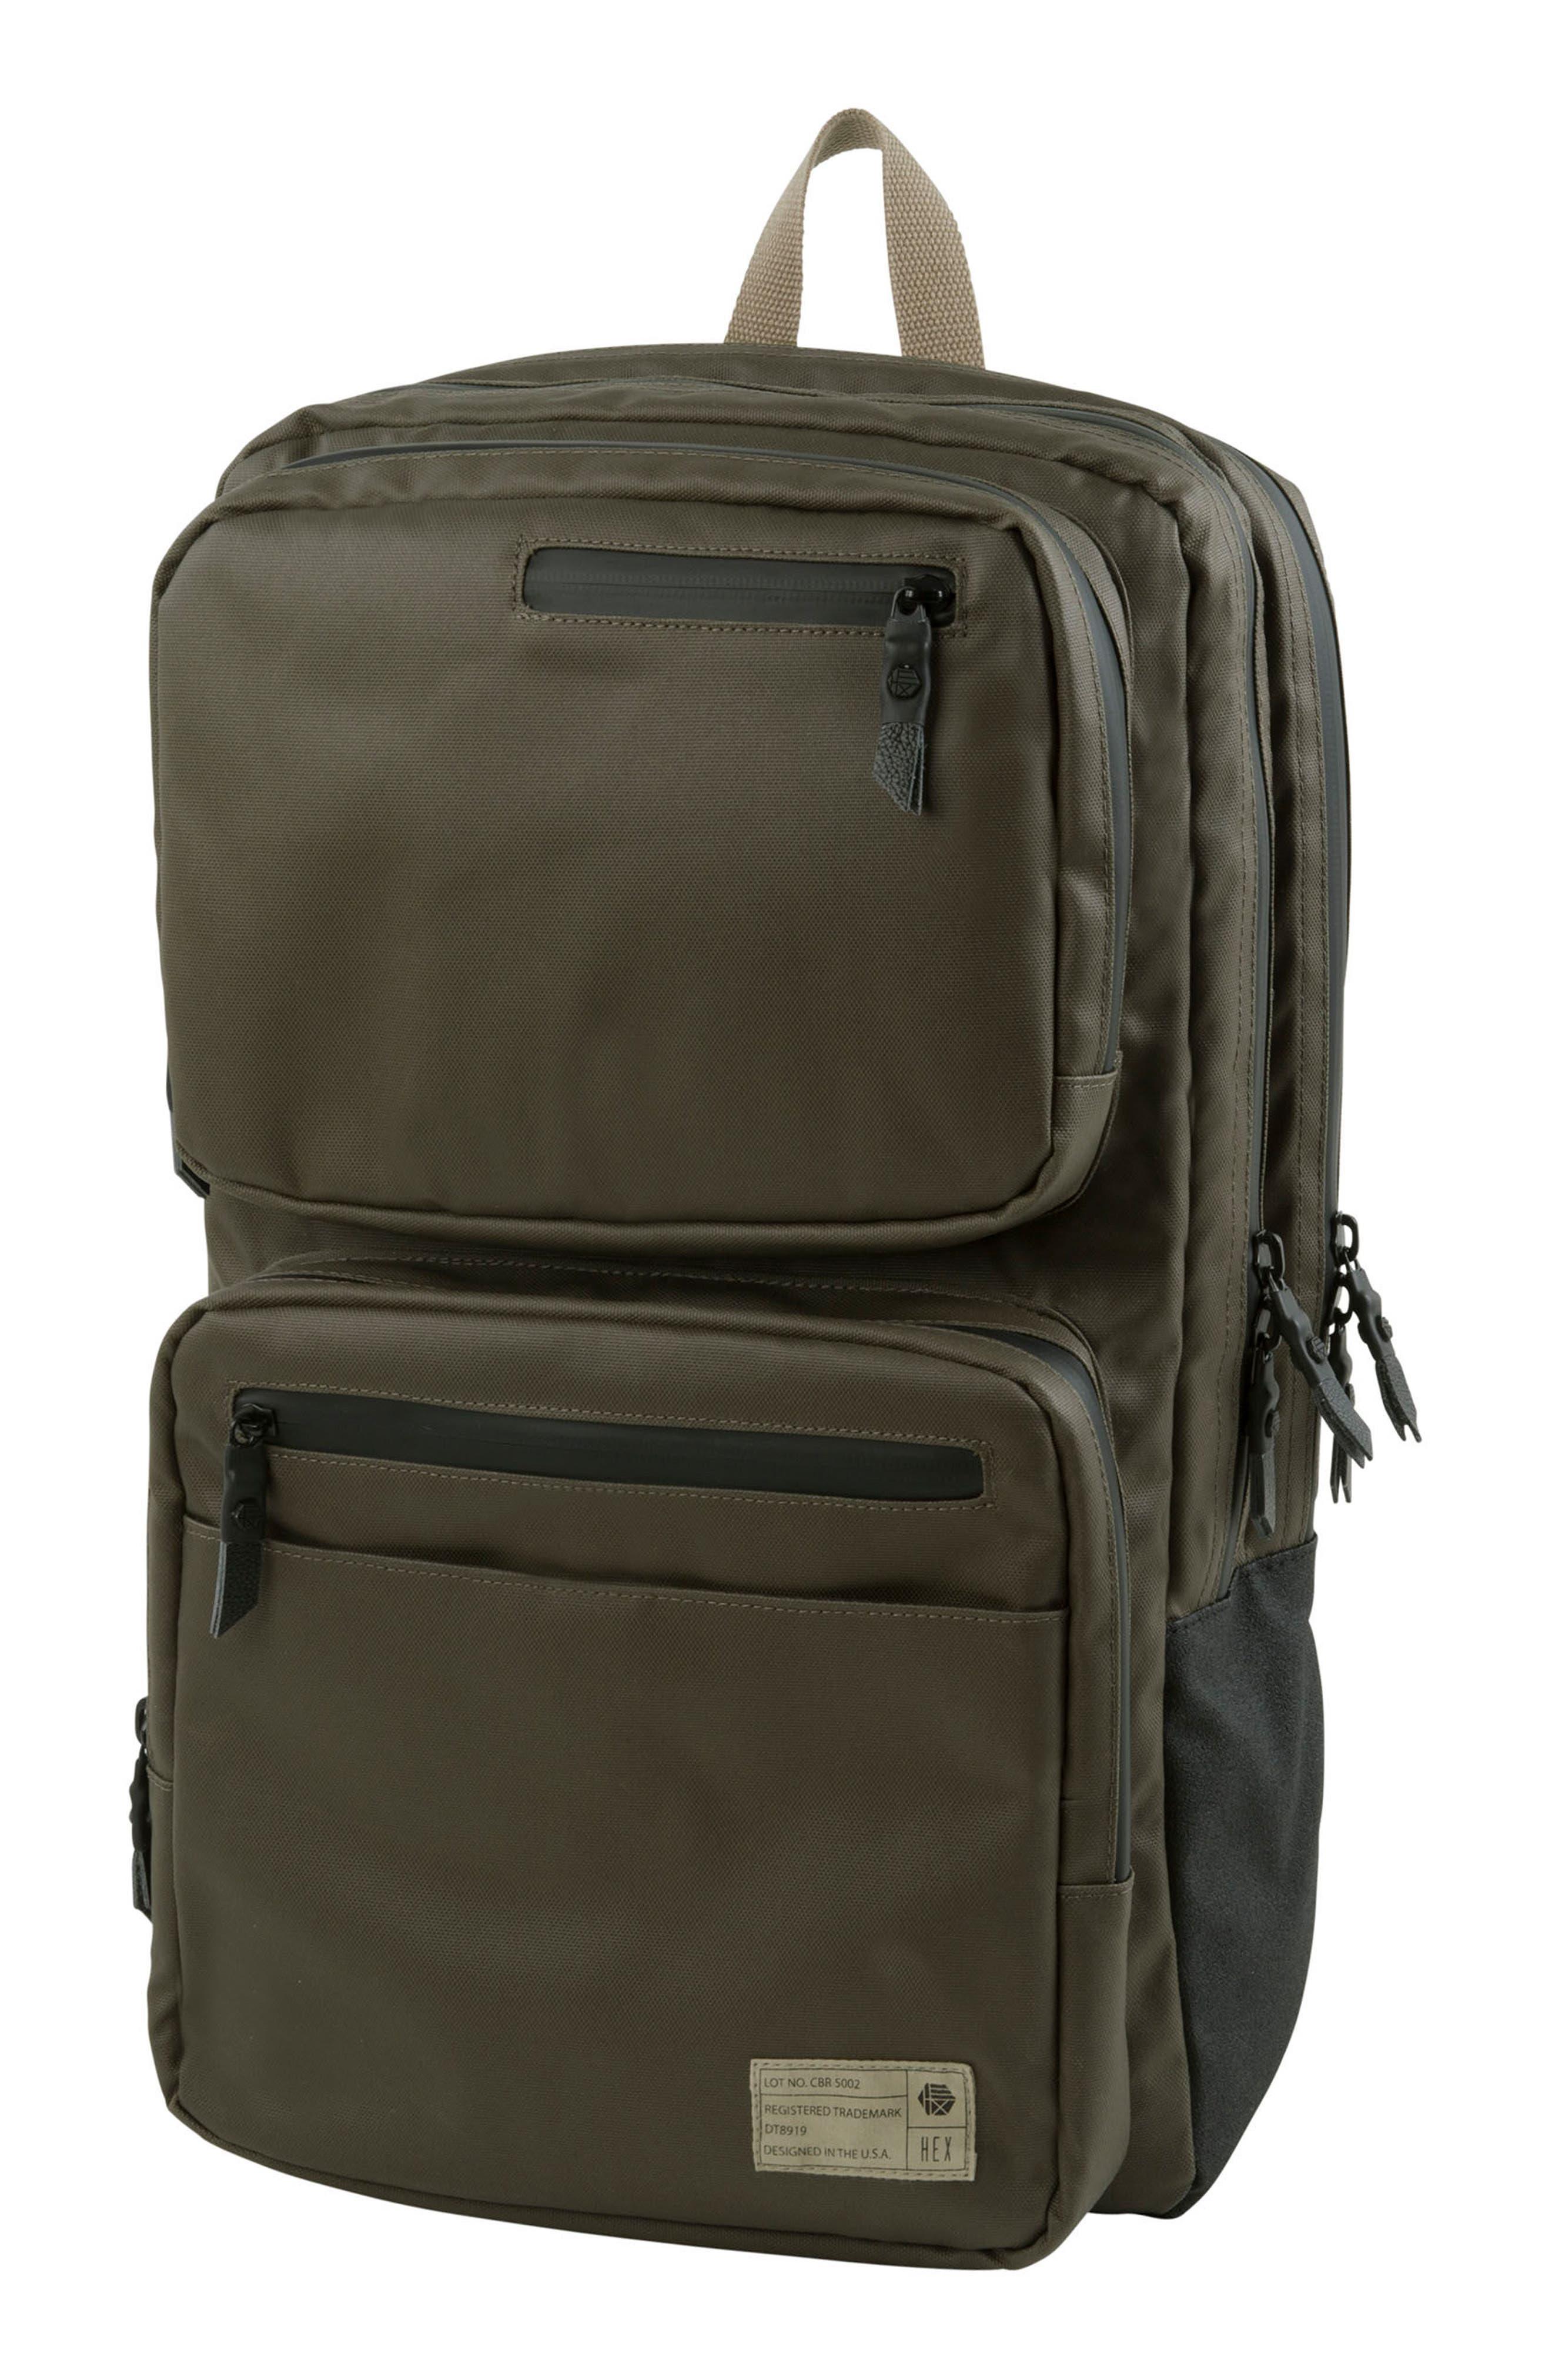 Patrol Backpack,                             Main thumbnail 1, color,                             Olive